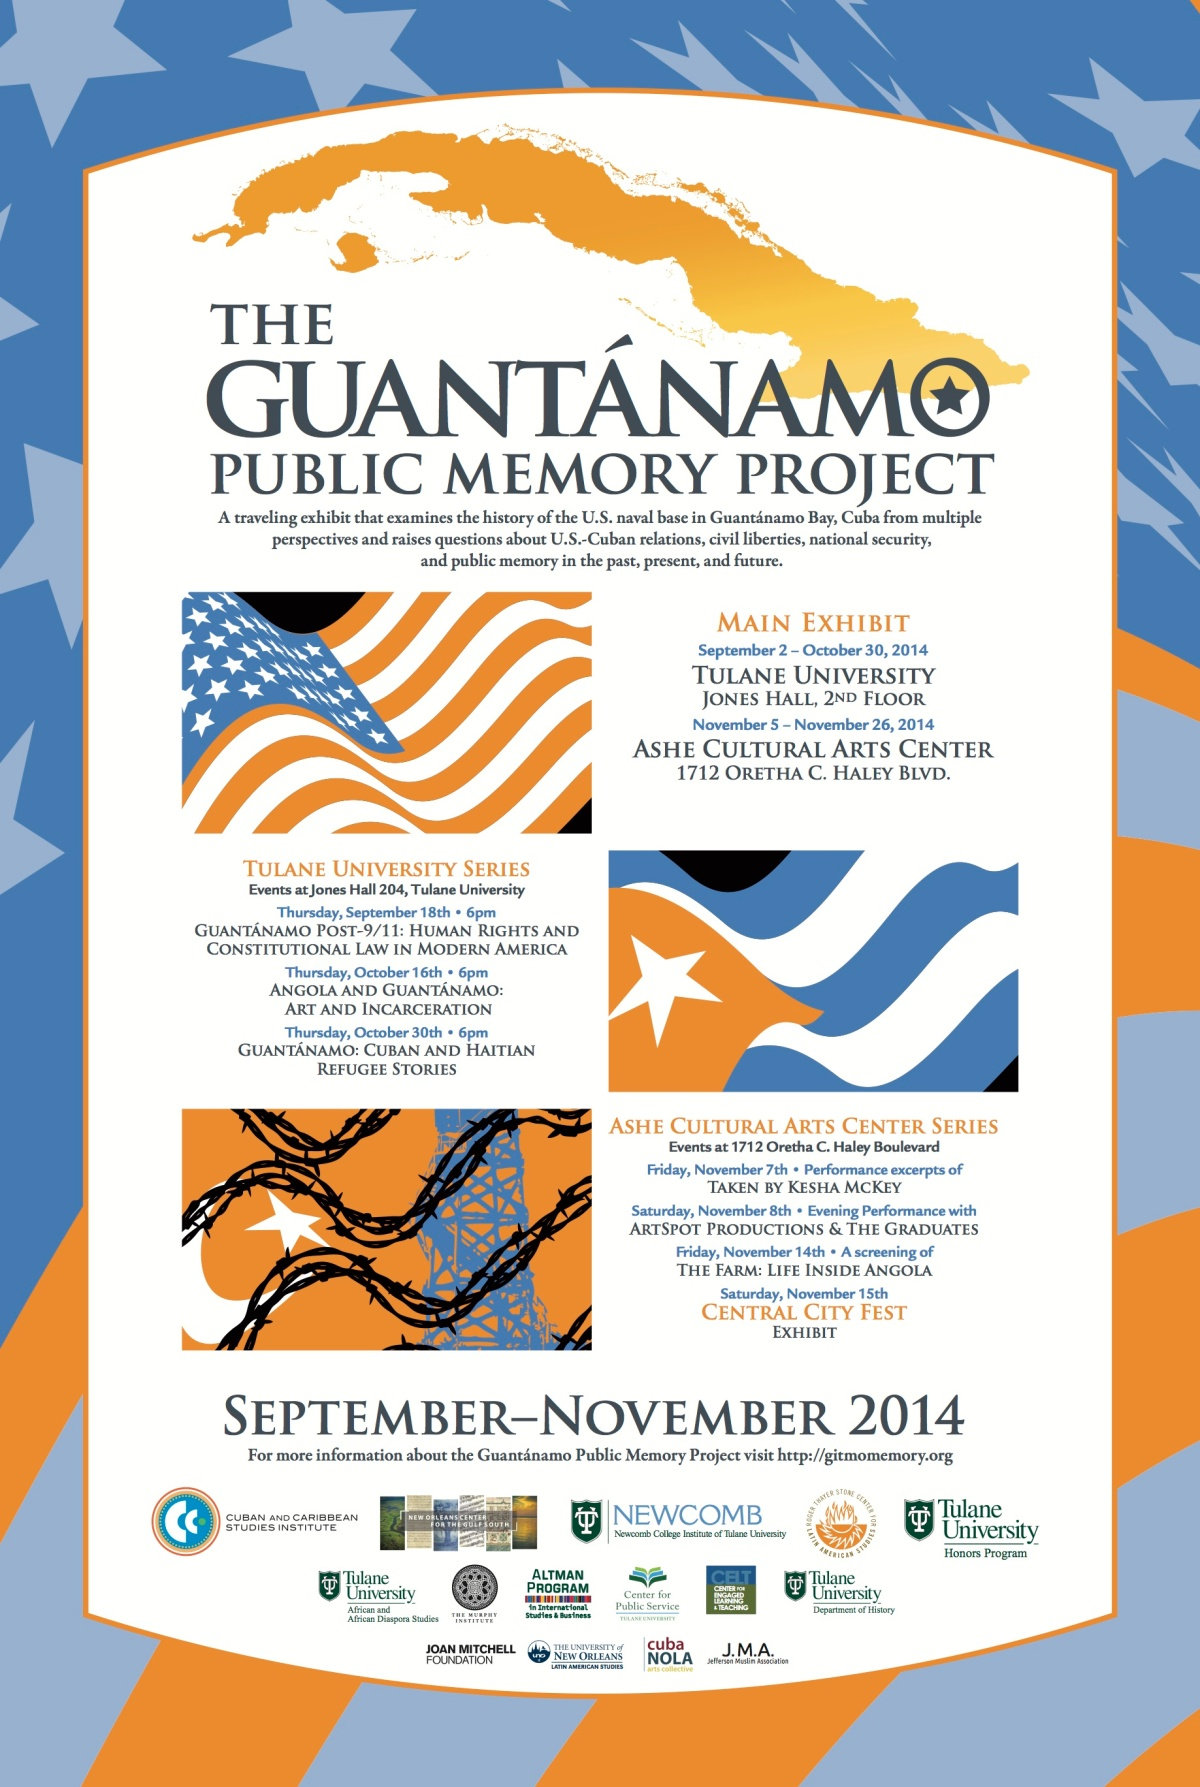 Guantánamo Public Memory Project comes toTulane